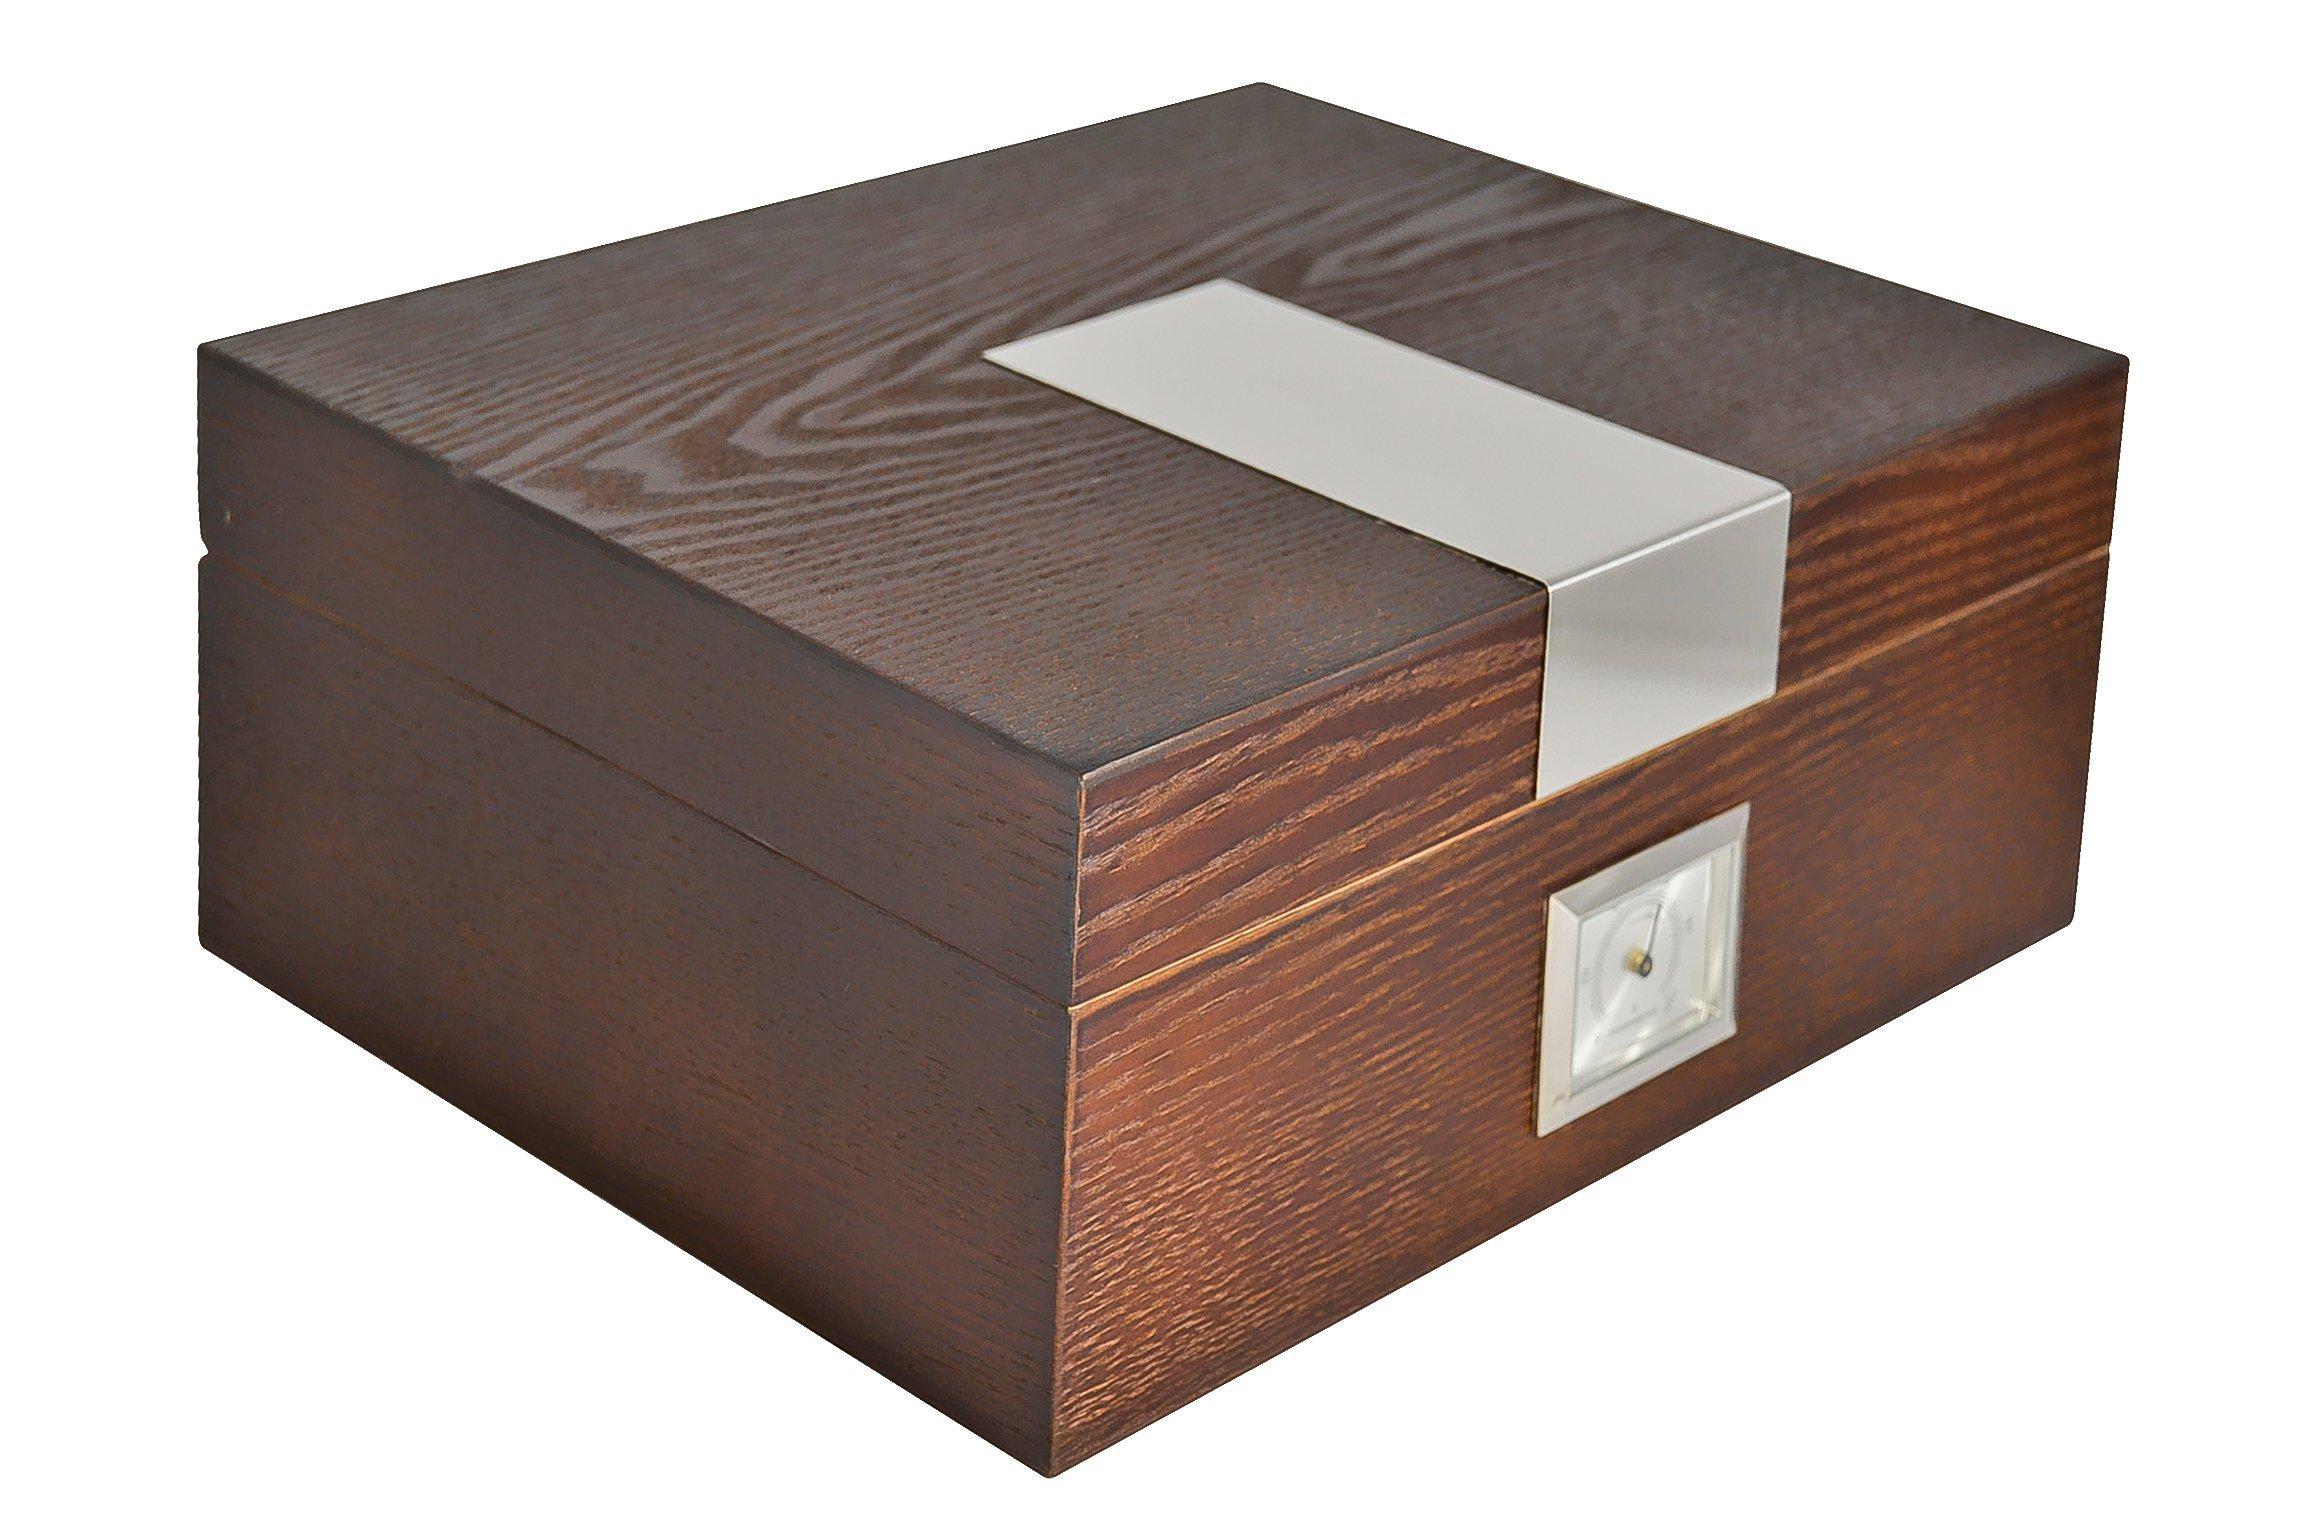 La Madera Cubana Humidor Cedar and Ash Tree Cigar Humidor with Humidifier & Hygrometer Cigars Box Set, Durable & Elegant Wood Design, Functional High-End Interior Perfect for 30-50 Cigars